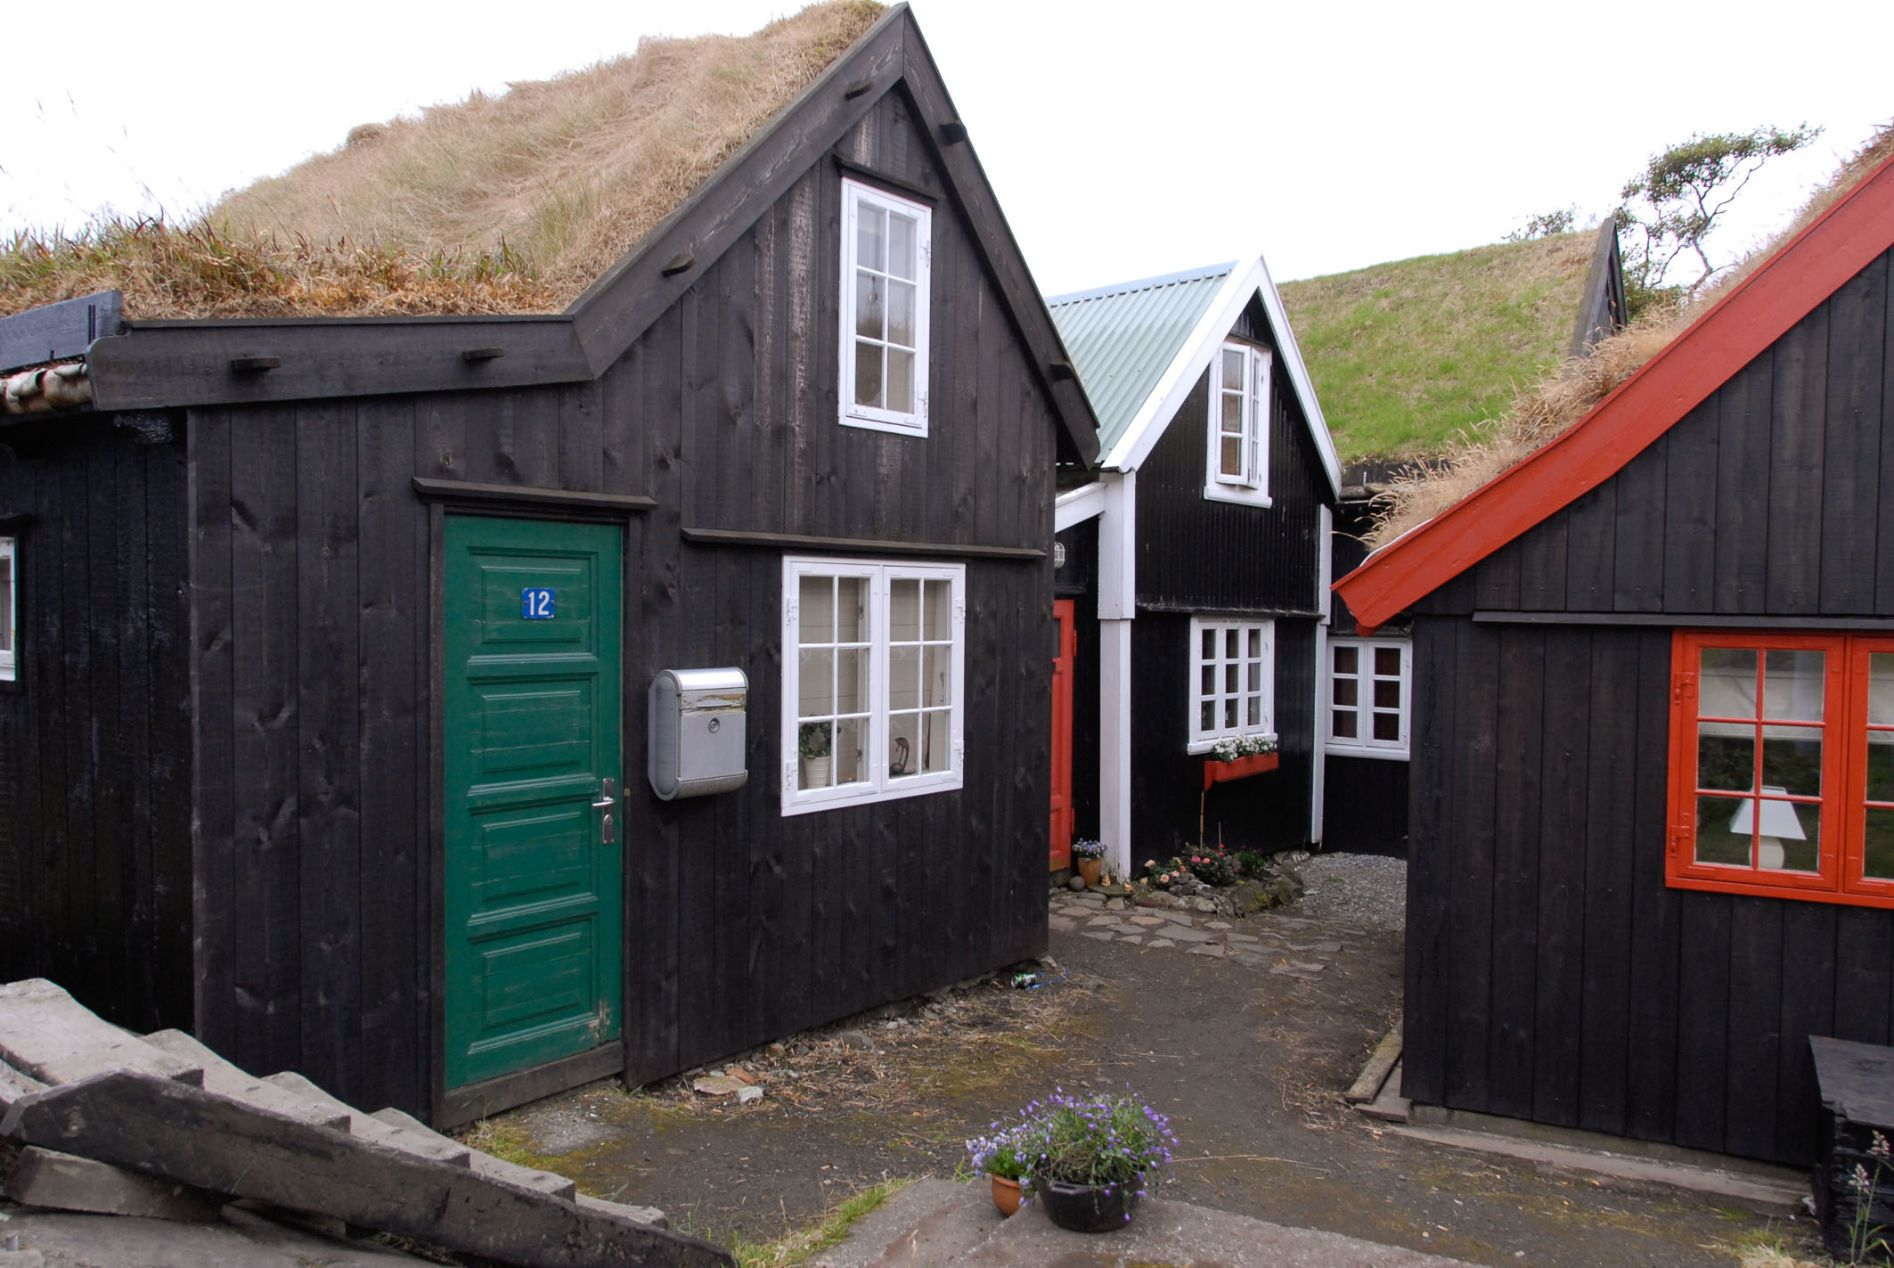 Stará zástavba v Tórshavnu, faerské metropoli